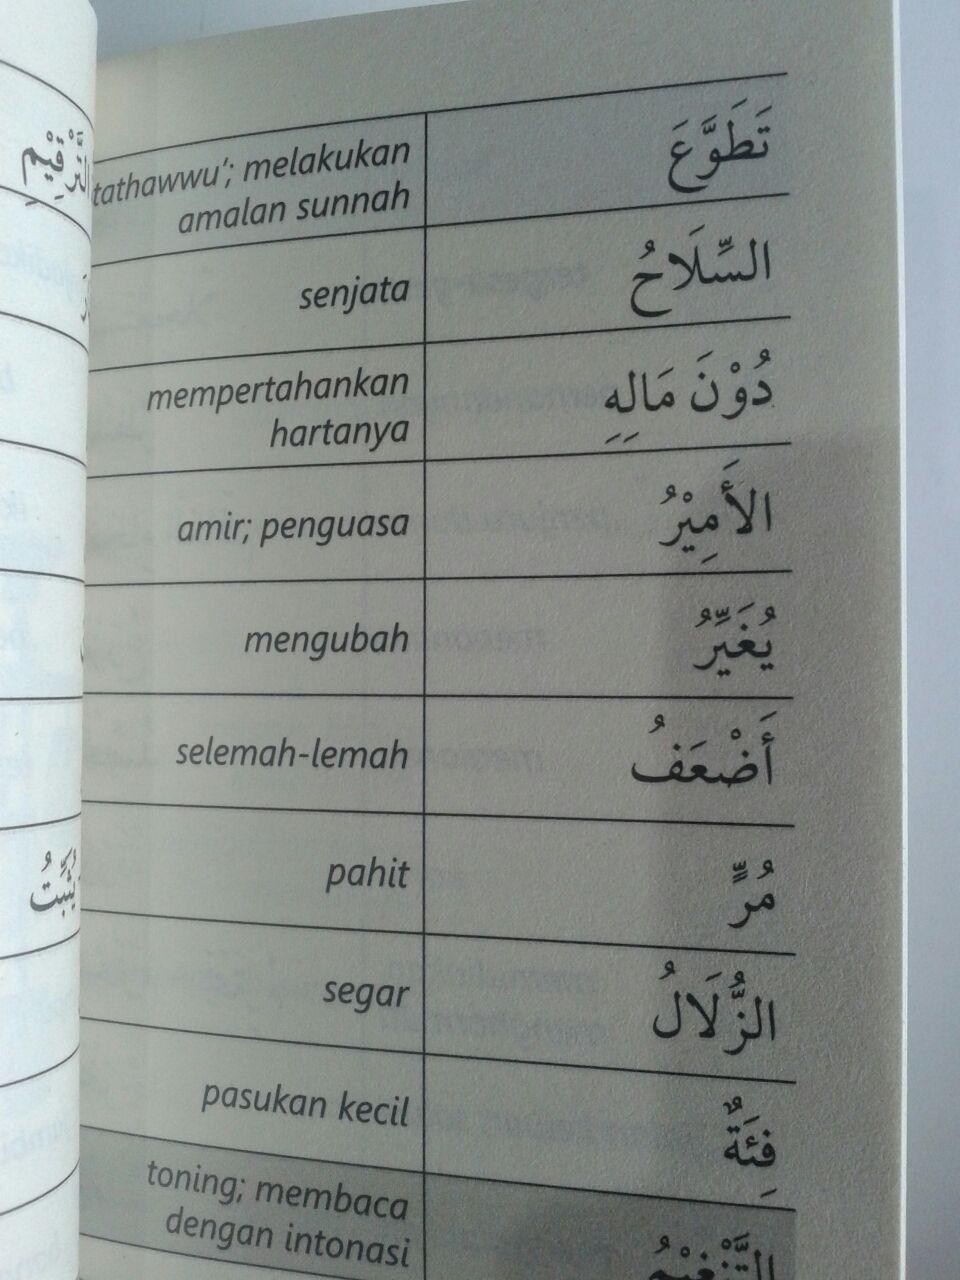 Buku Kamus Durusul Lughah Jilid 3-4 isi 3